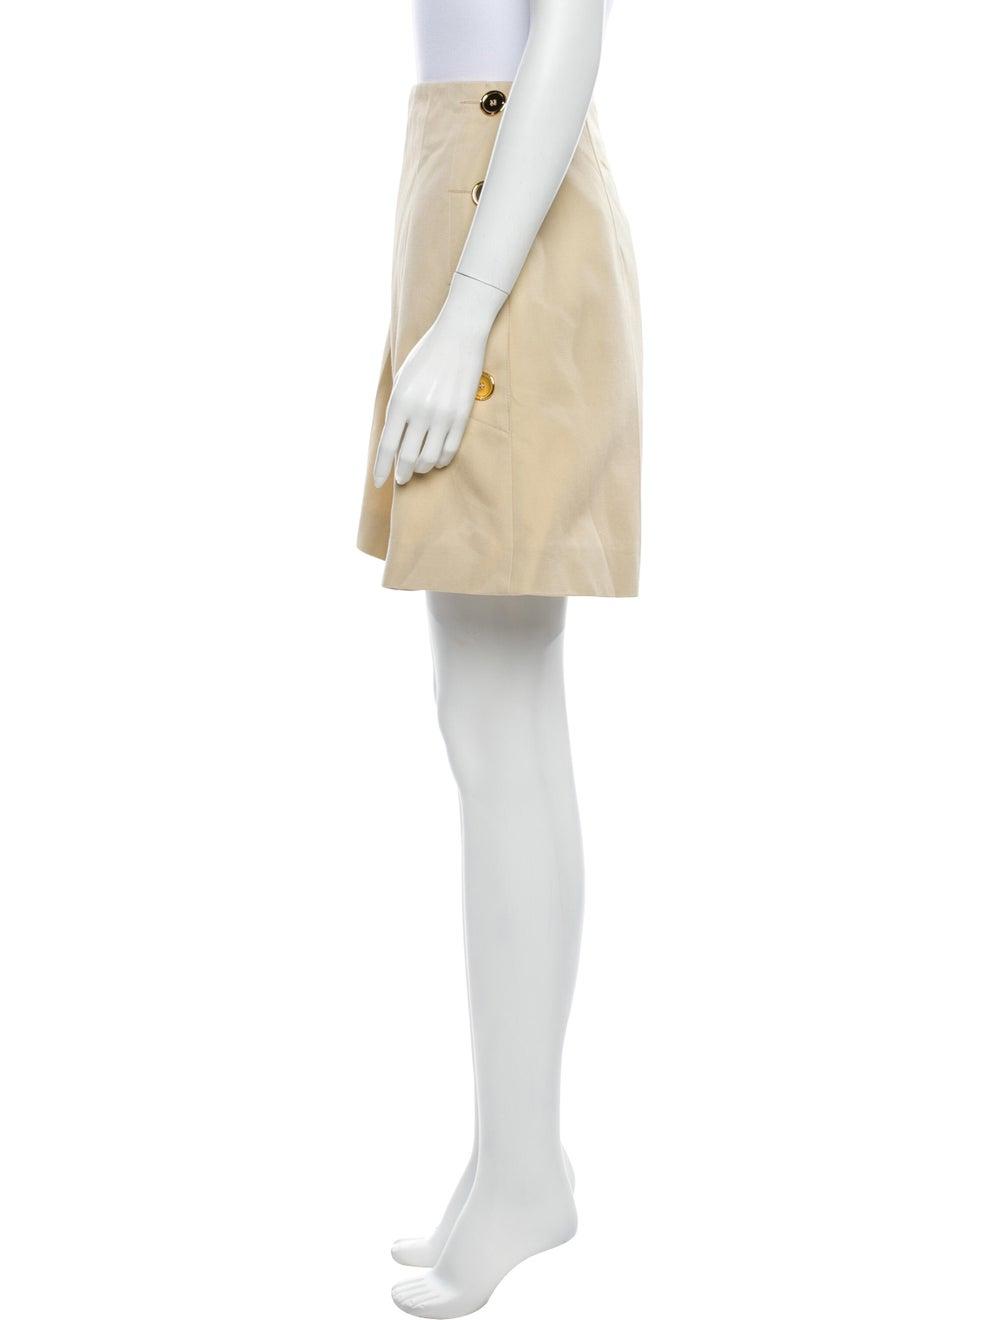 Patou Knee-Length Shorts w/ Tags - image 2